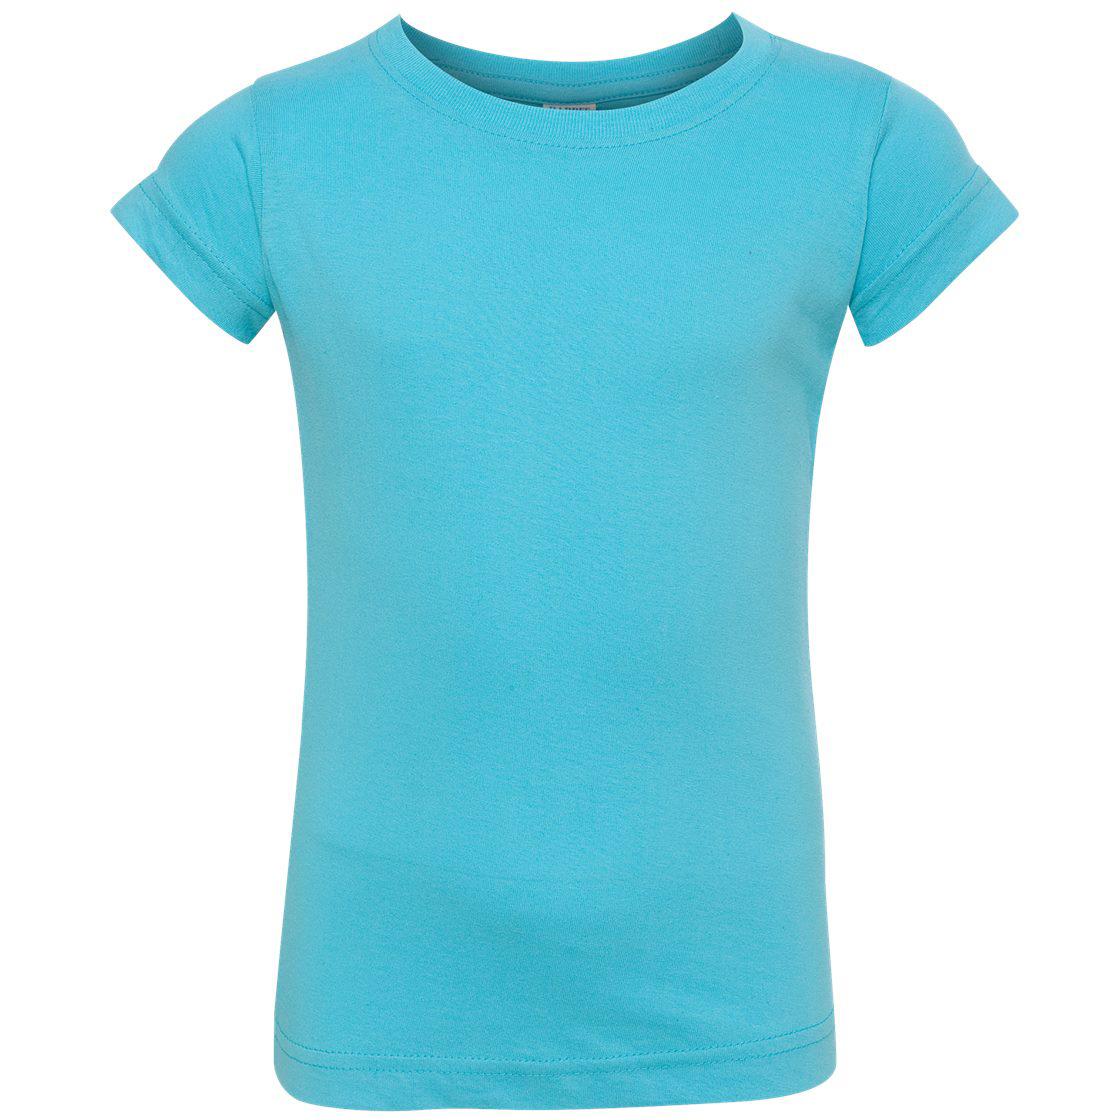 Rabbit skins 3316 fine jersey toddler girl 39 s t shirt for Aqua blue color t shirt